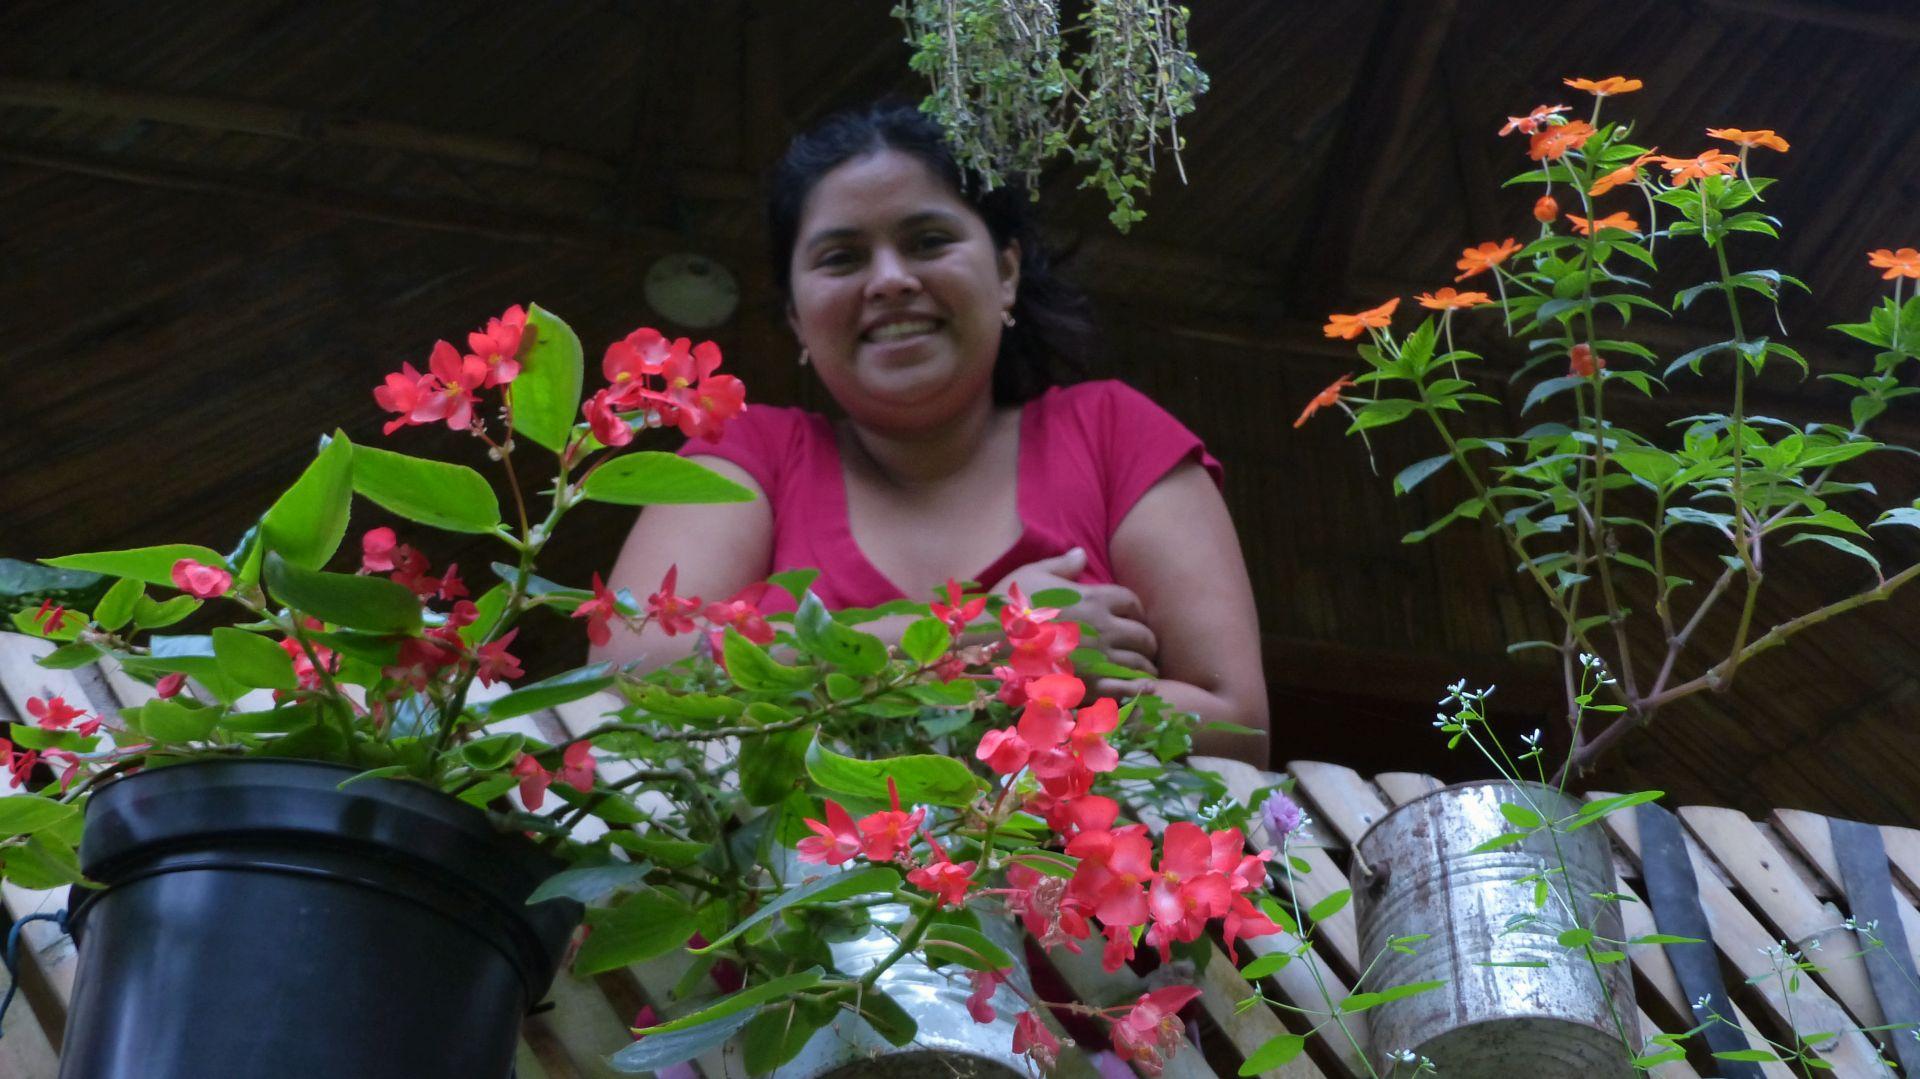 P1370056 caretakers house flowers